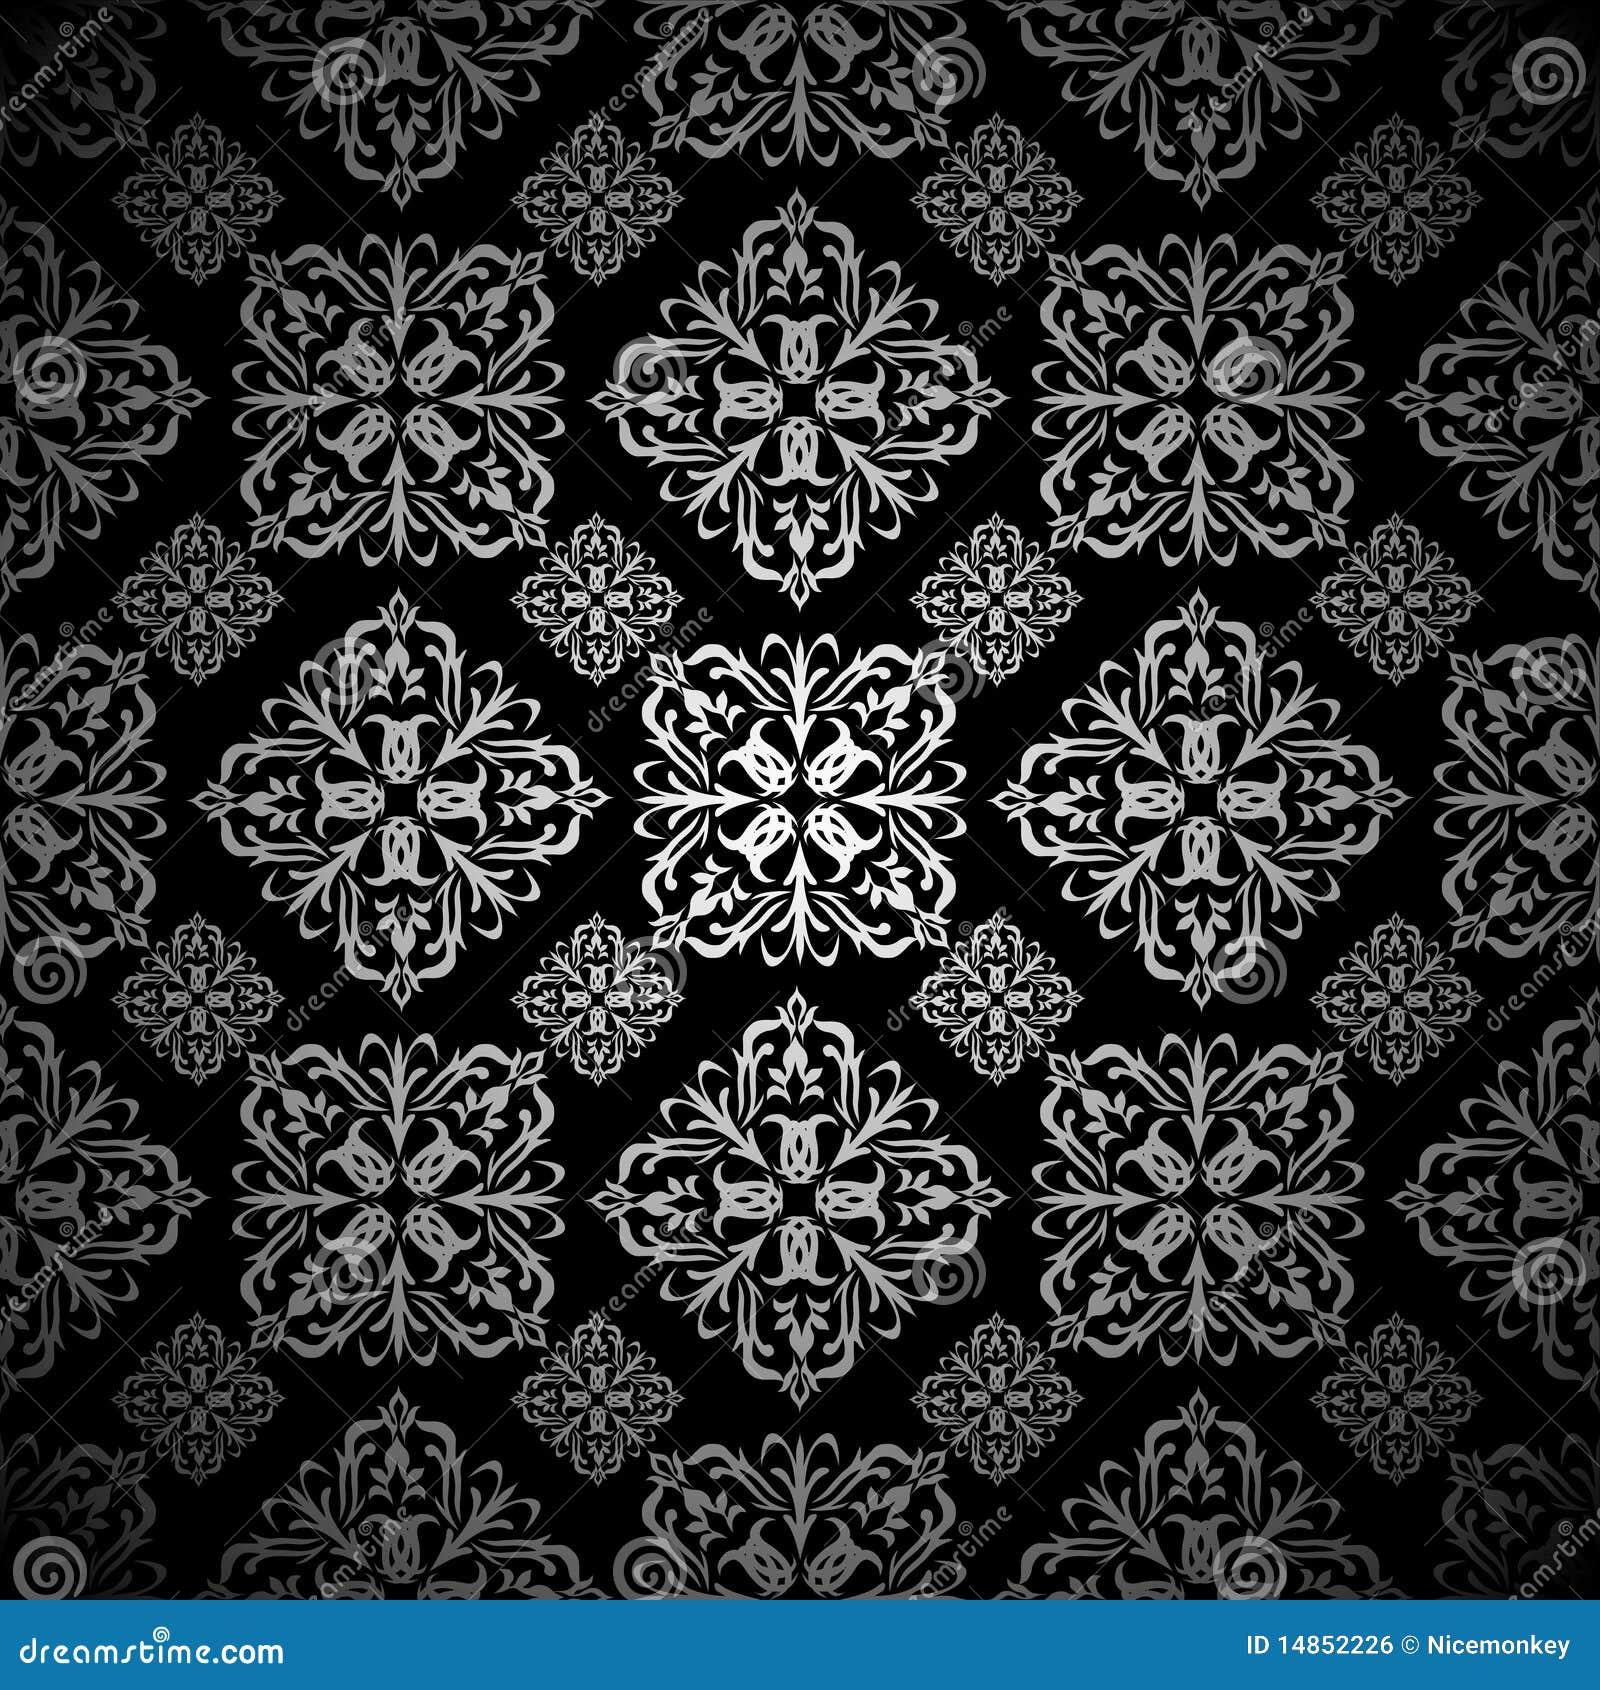 Floral wallpaper silver tile